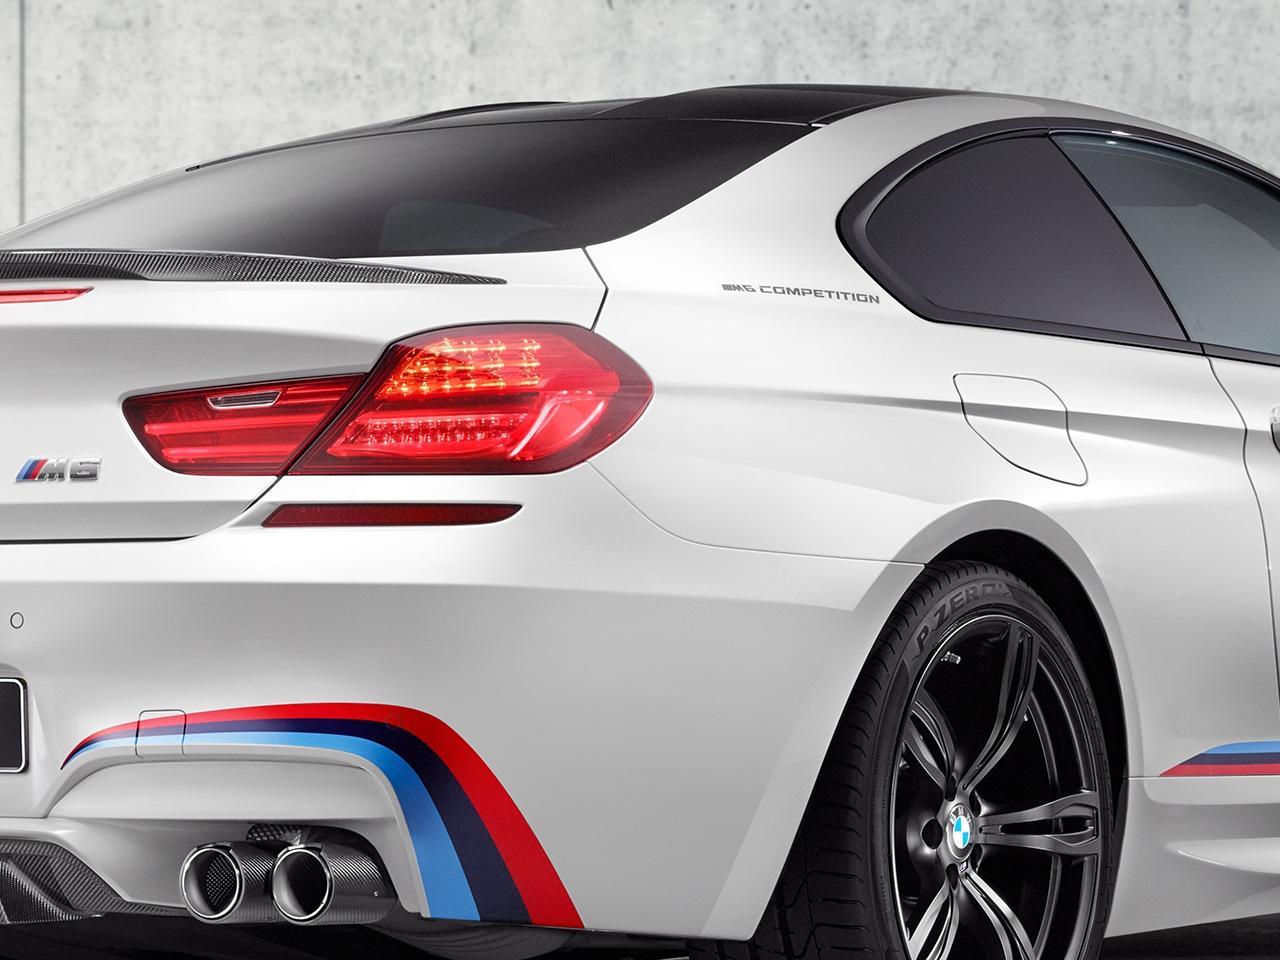 BMW-M6-COMPETITION-frankfurt-iaa-prezzo-2015_0-100_3